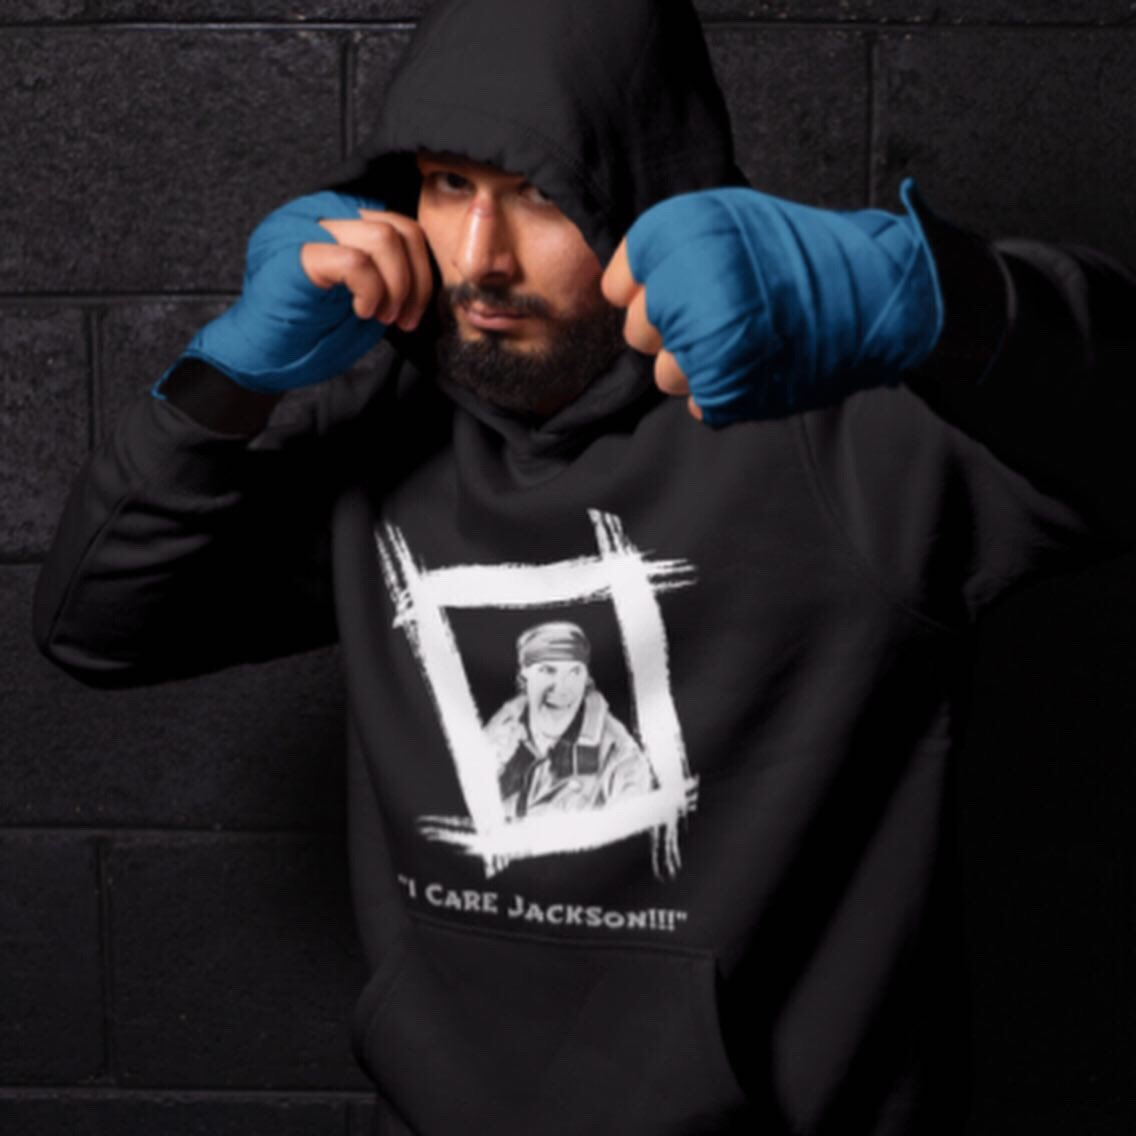 """I Care Jackson!!!"" Winter Hoodies now available! 😂😂😂  https://nerdyurges-com.myshopify.com/collections/warriorwear-clothing-collection…  #martialarts #fighting #mma #stunts #film #movies #lorenavedon #karate #taekwondo #kickboxing #muaythai #Winterfashion #fashion #apparel  #warriorwearclothing  #photography #cosplay #hoodieseason"